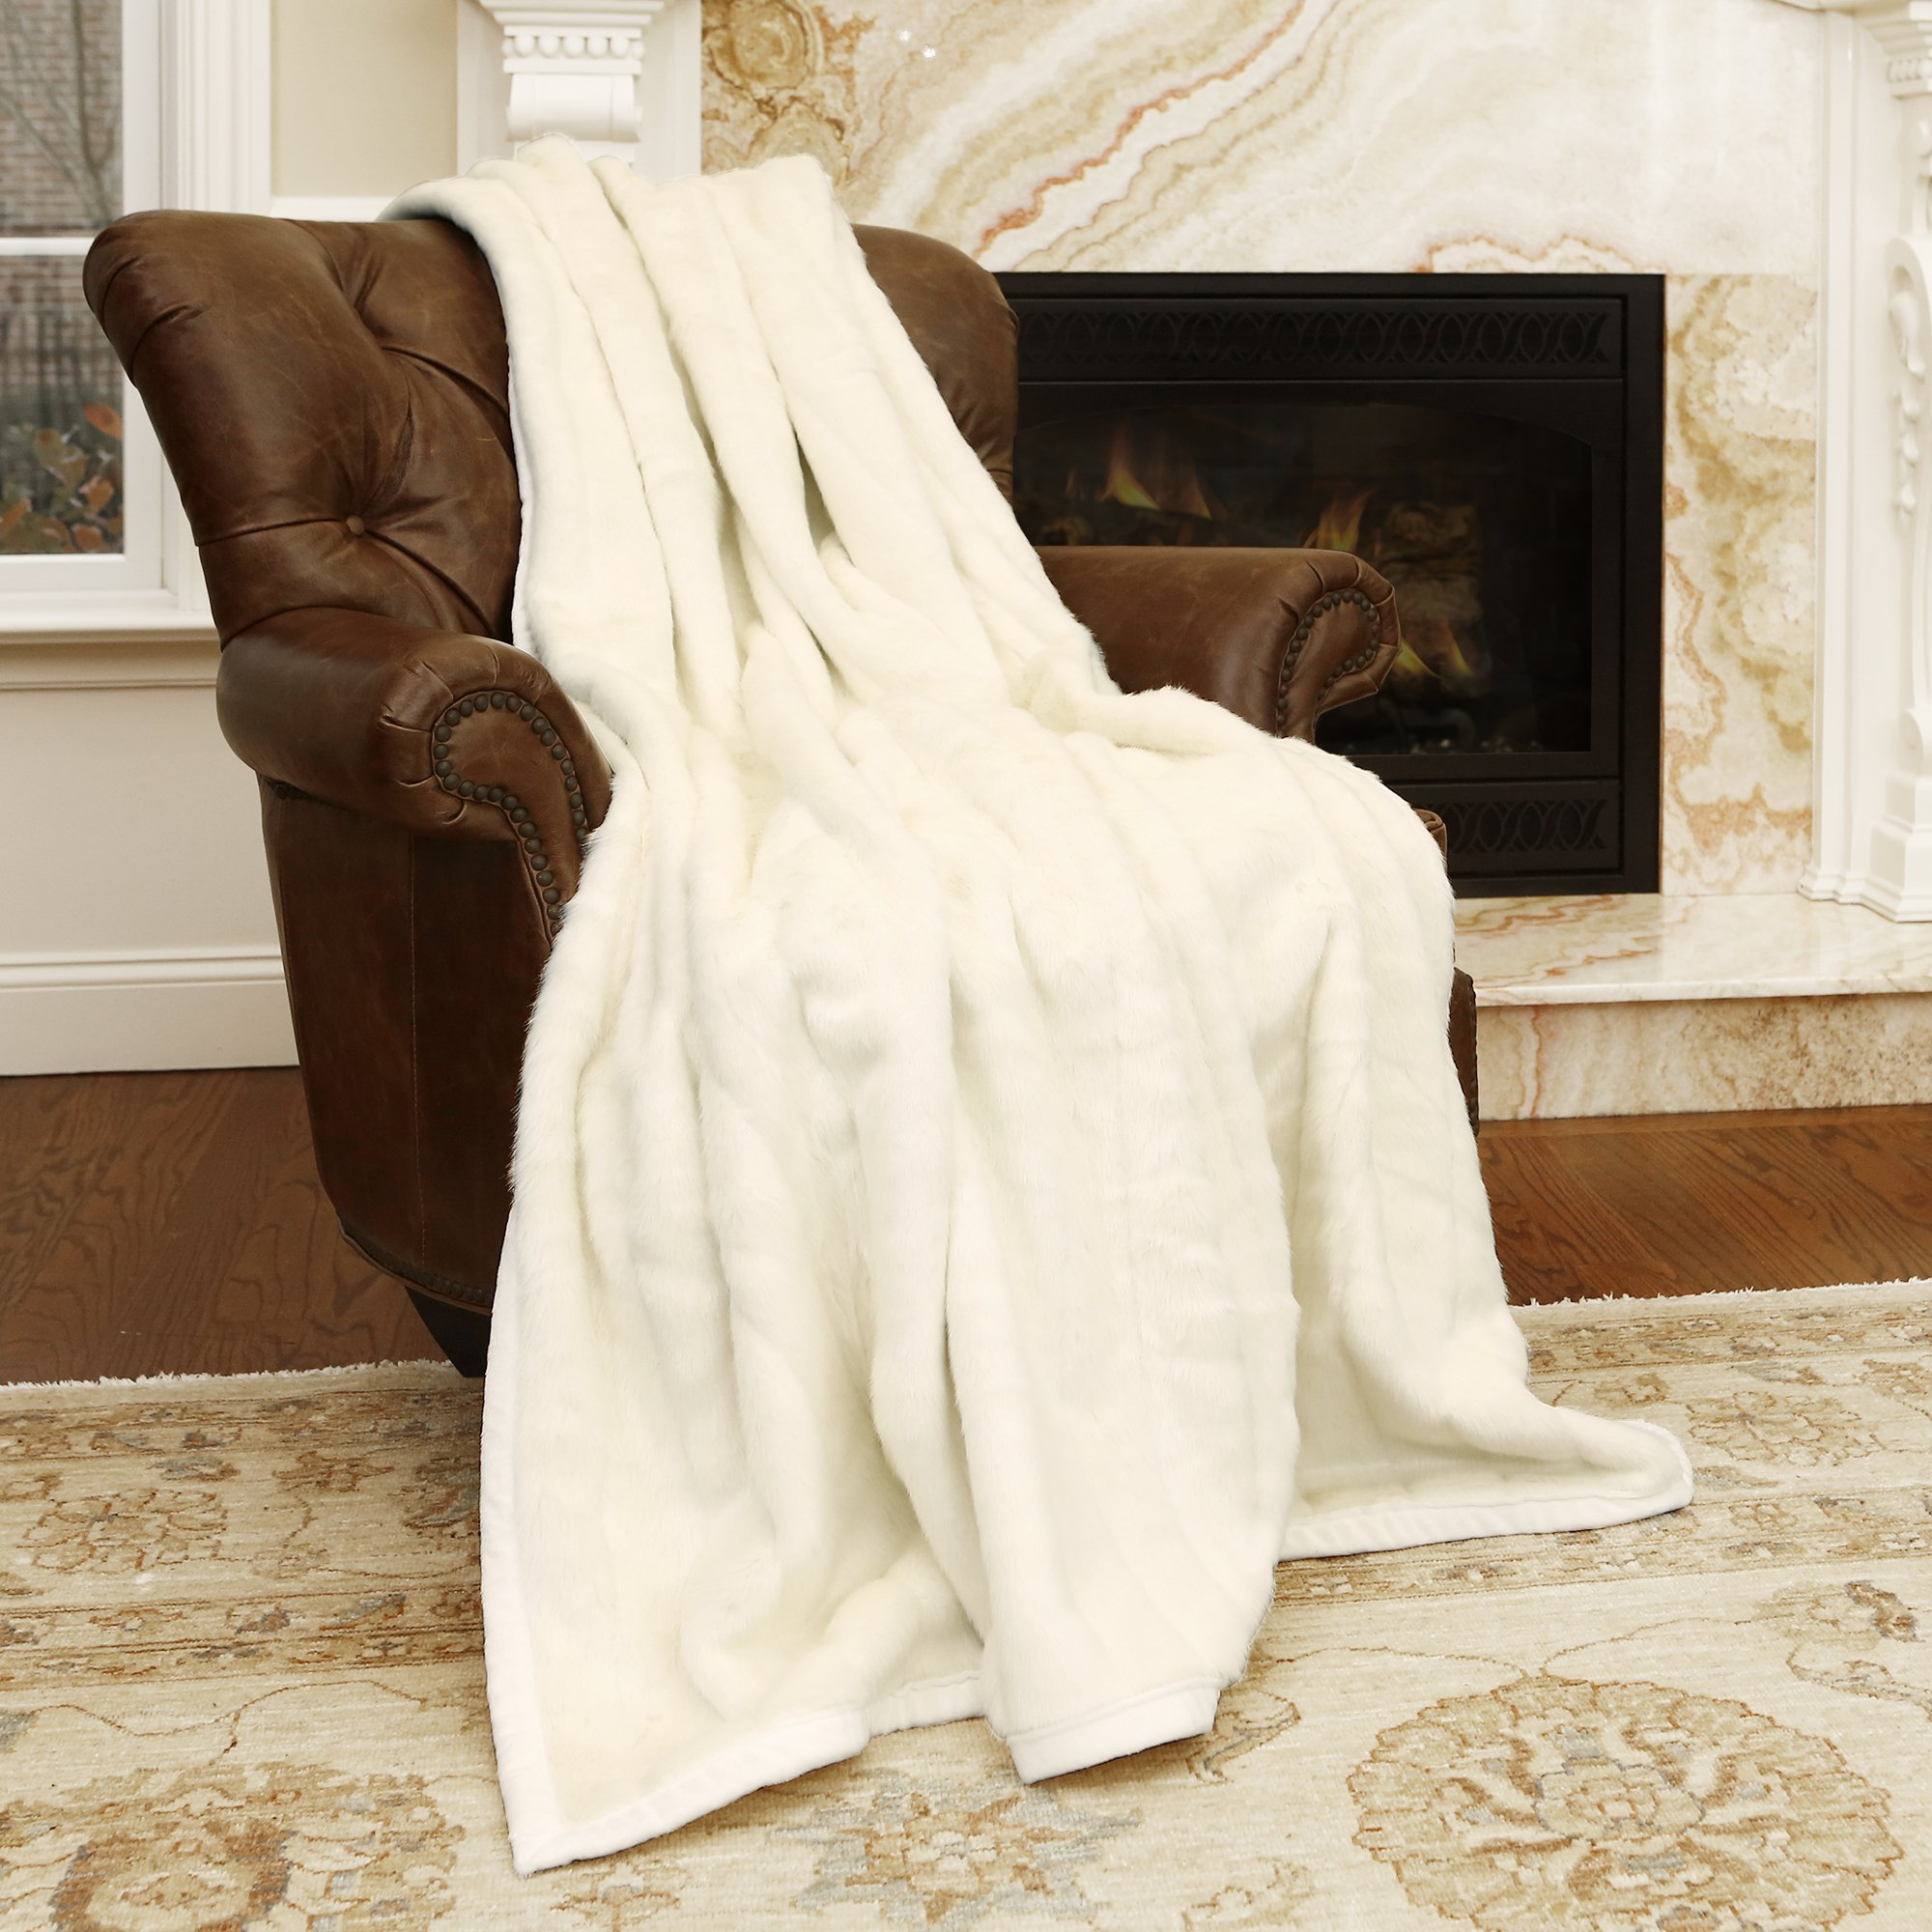 Best Home Fashion Faux Fur Throw - Lounge Blanket - White Mink - 58''W x 60''L - (1 Throw)